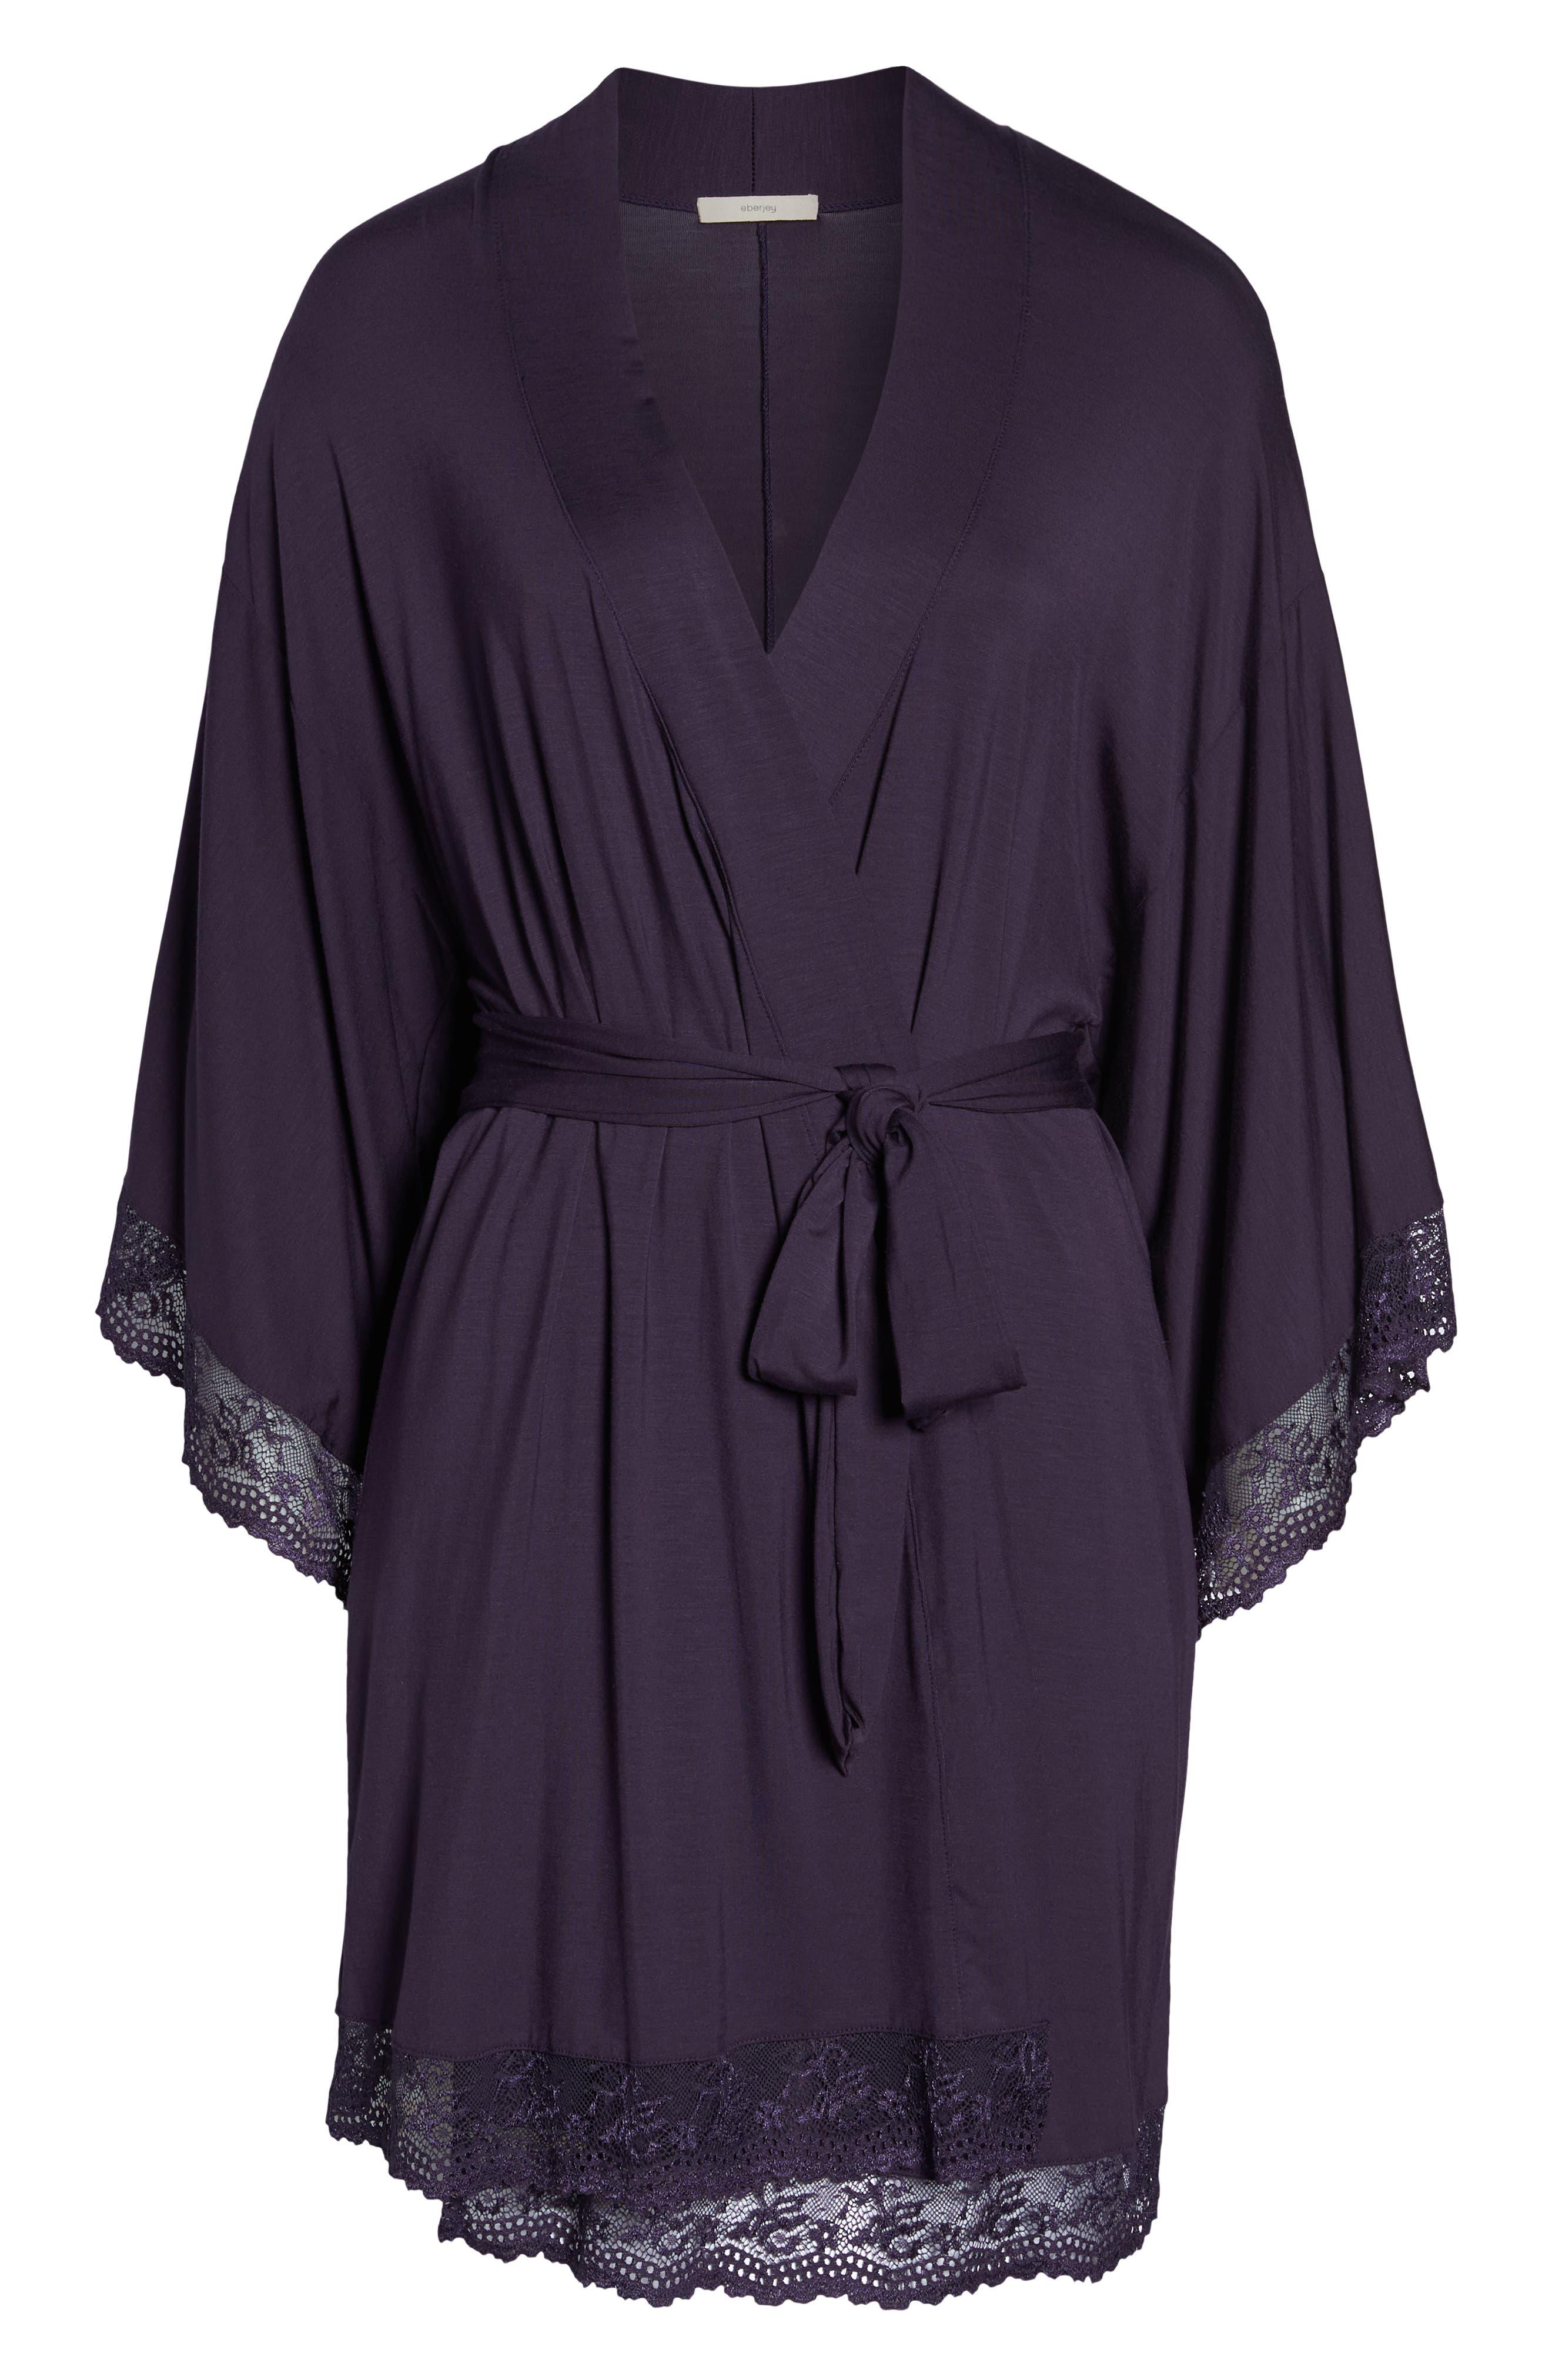 EBERJEY,                             'Colette' Kimono Robe,                             Alternate thumbnail 6, color,                             MYSTERIOSO